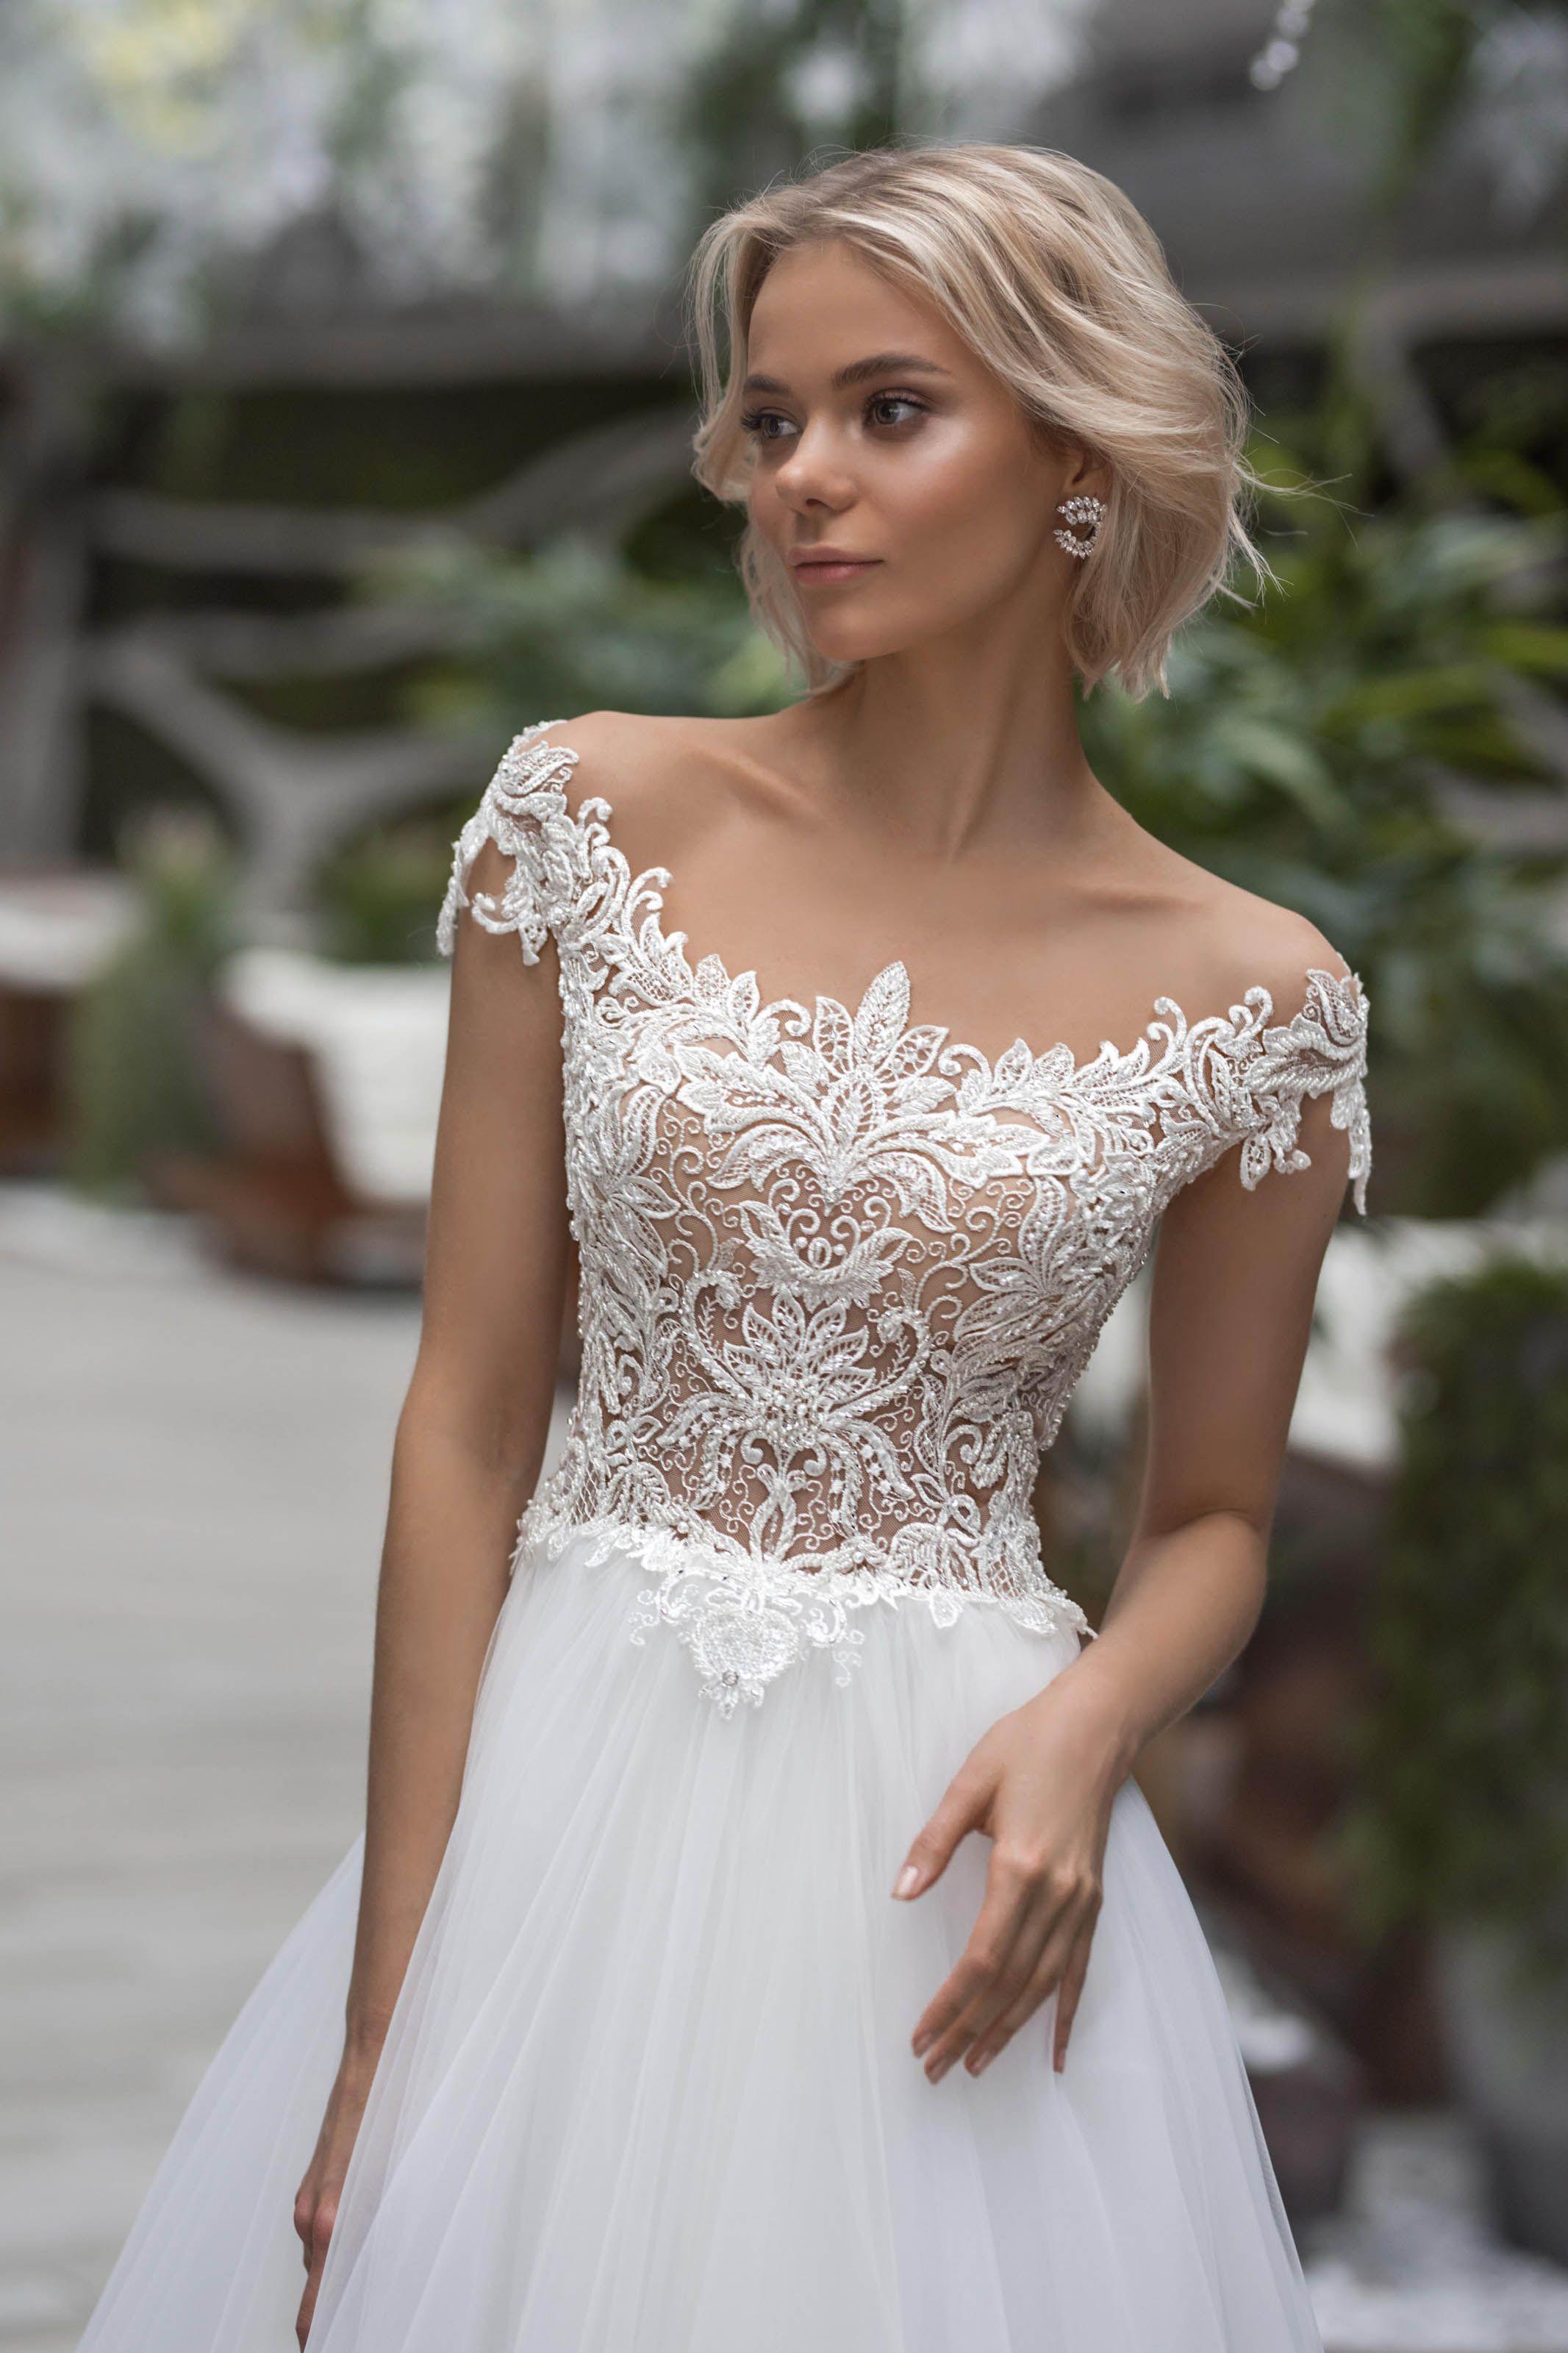 Wedding Dress Sinuosa By Strekoza Off Shoulder Neckline A Line Simple Wedding Dress W Sheer Wedding Dress Bridesmaid Dresses Long Navy Navy Bridesmaid Dresses [ 3200 x 2133 Pixel ]